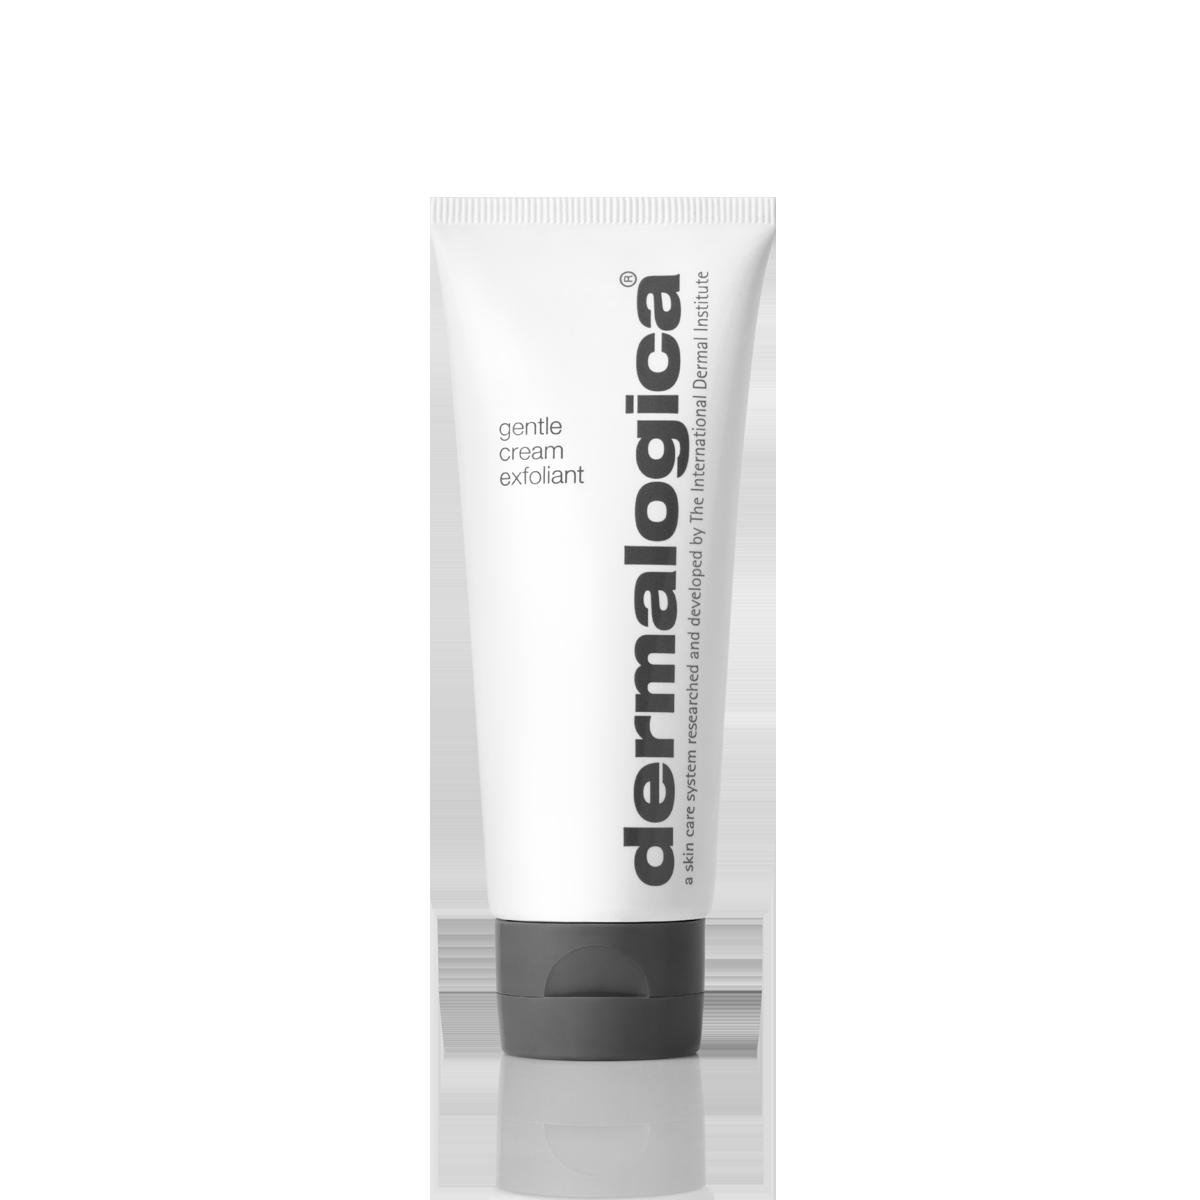 Gentle Cream Exfoliant - 75ml-1